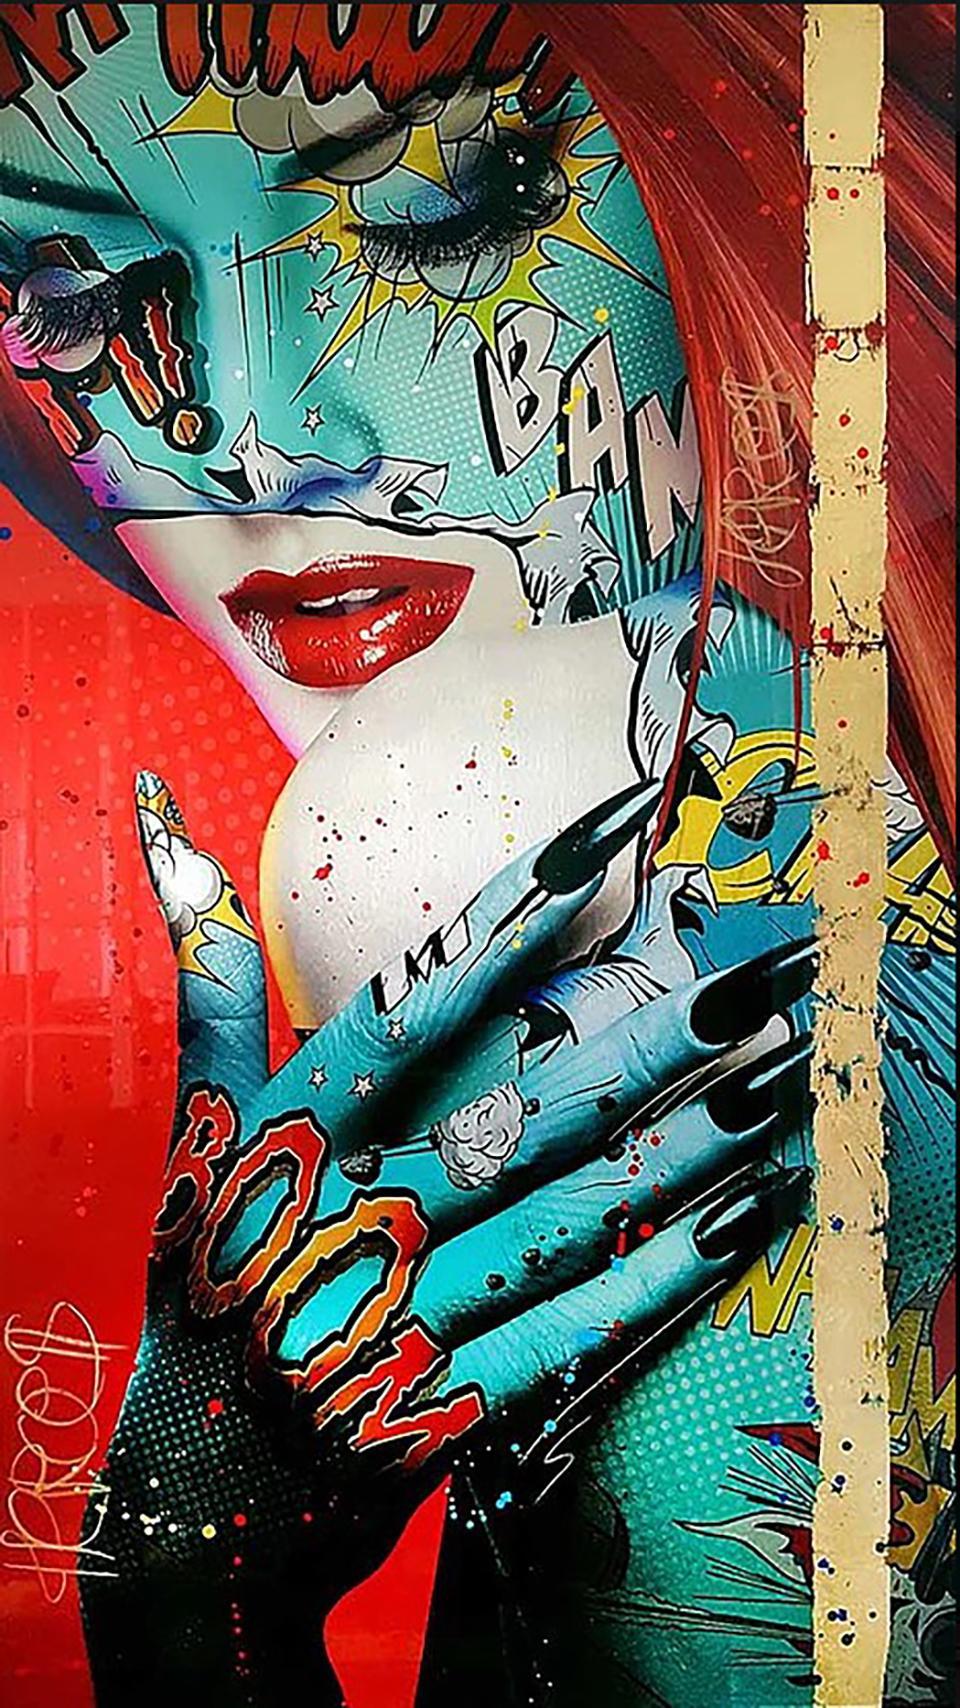 """Kimera"" -- Pop art, pop culture, feminism, woman power, woman empowerment"